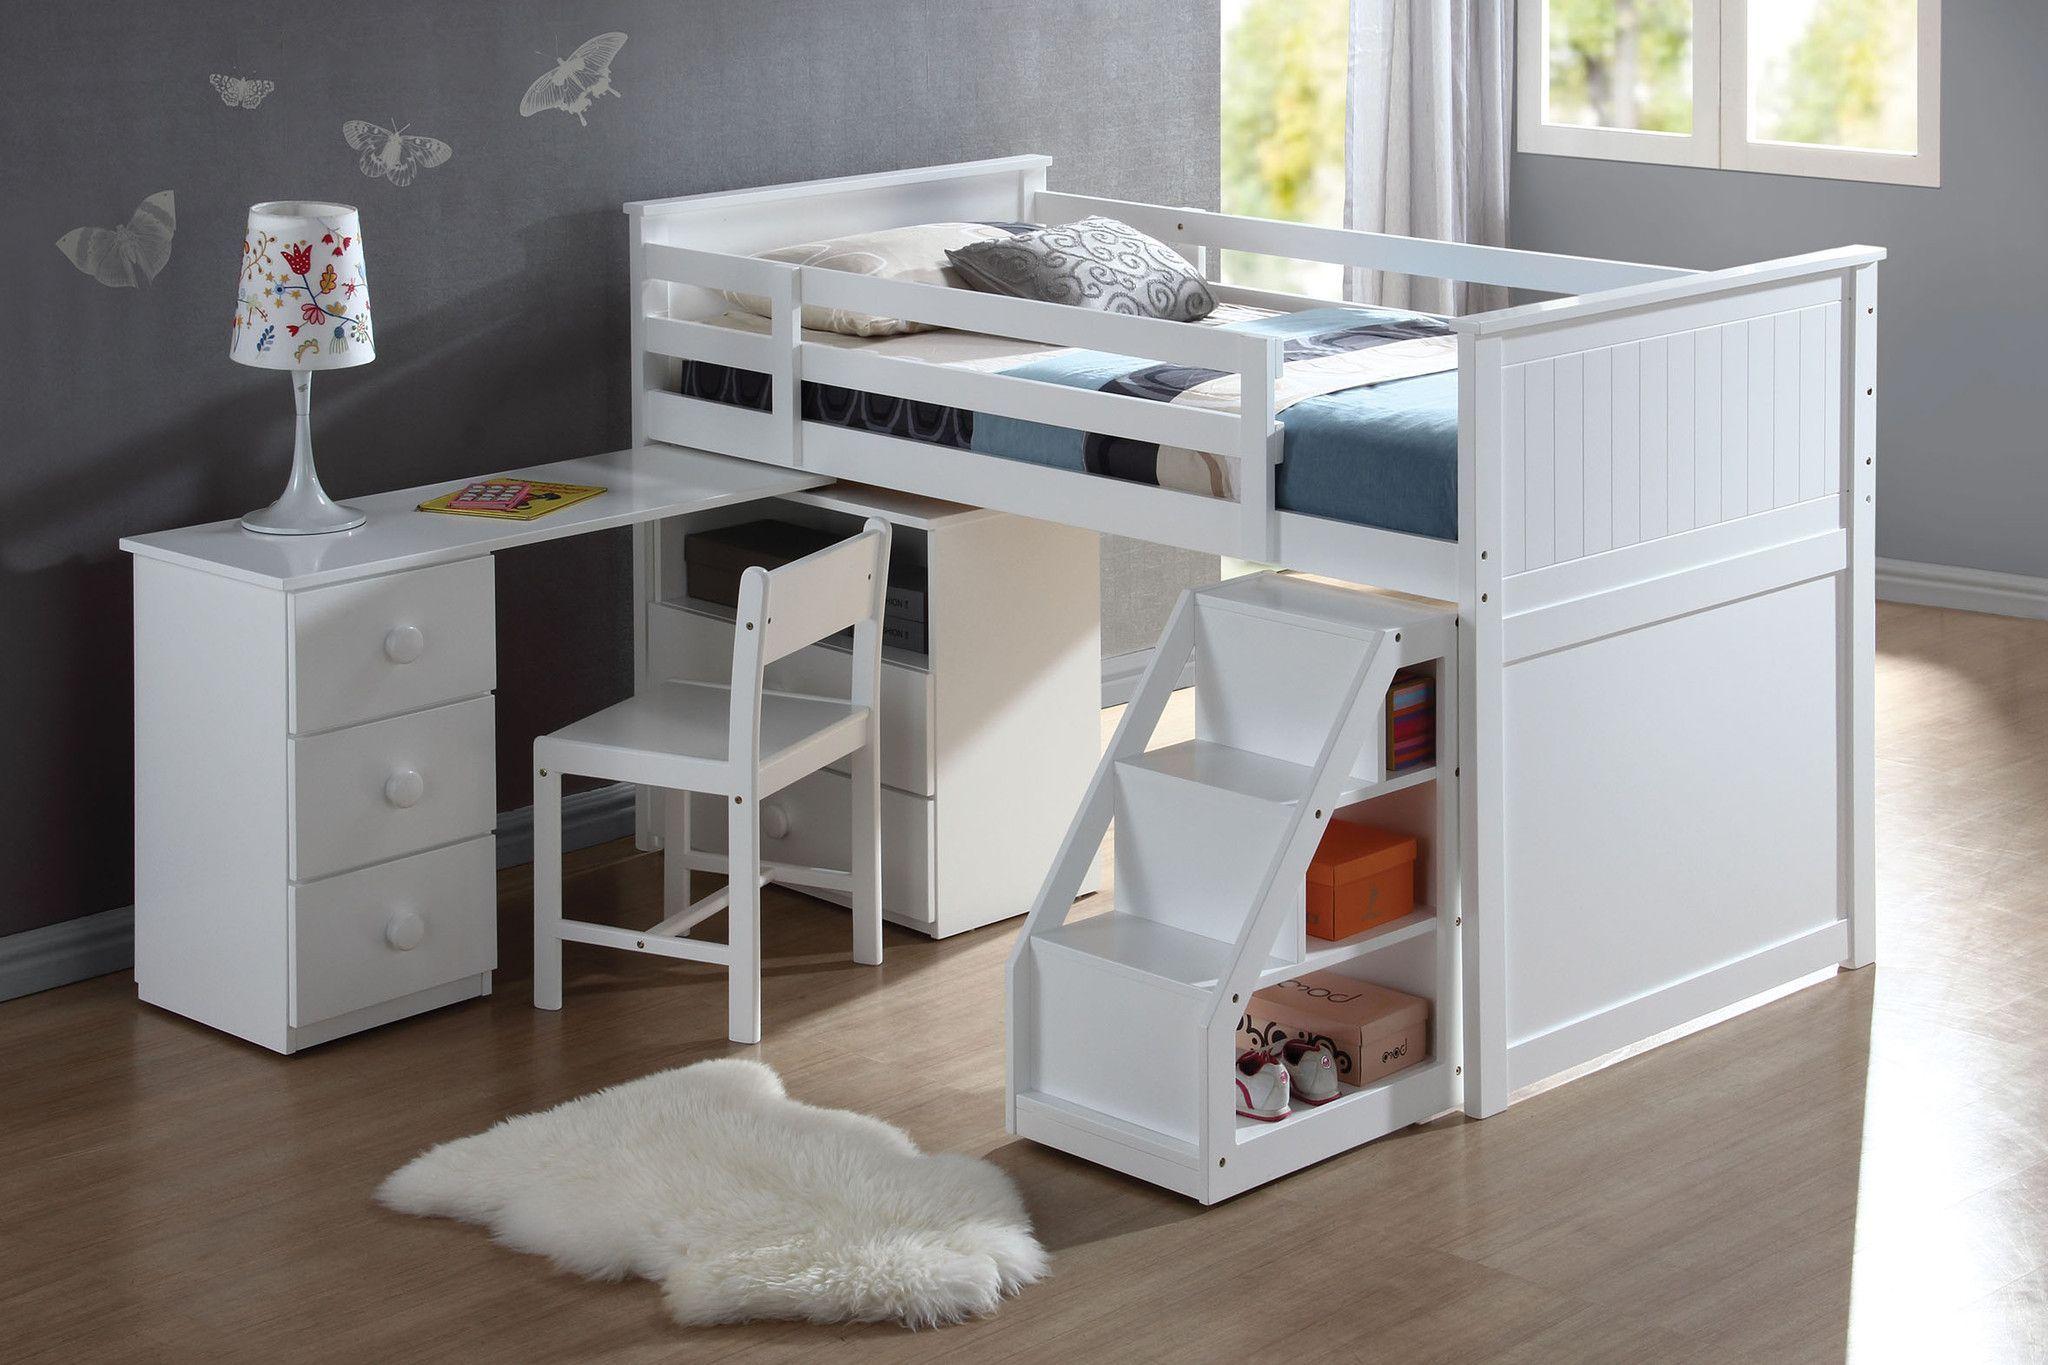 Wyatt Twin Loft Bed 19405 718 Features BuiltIn Desk